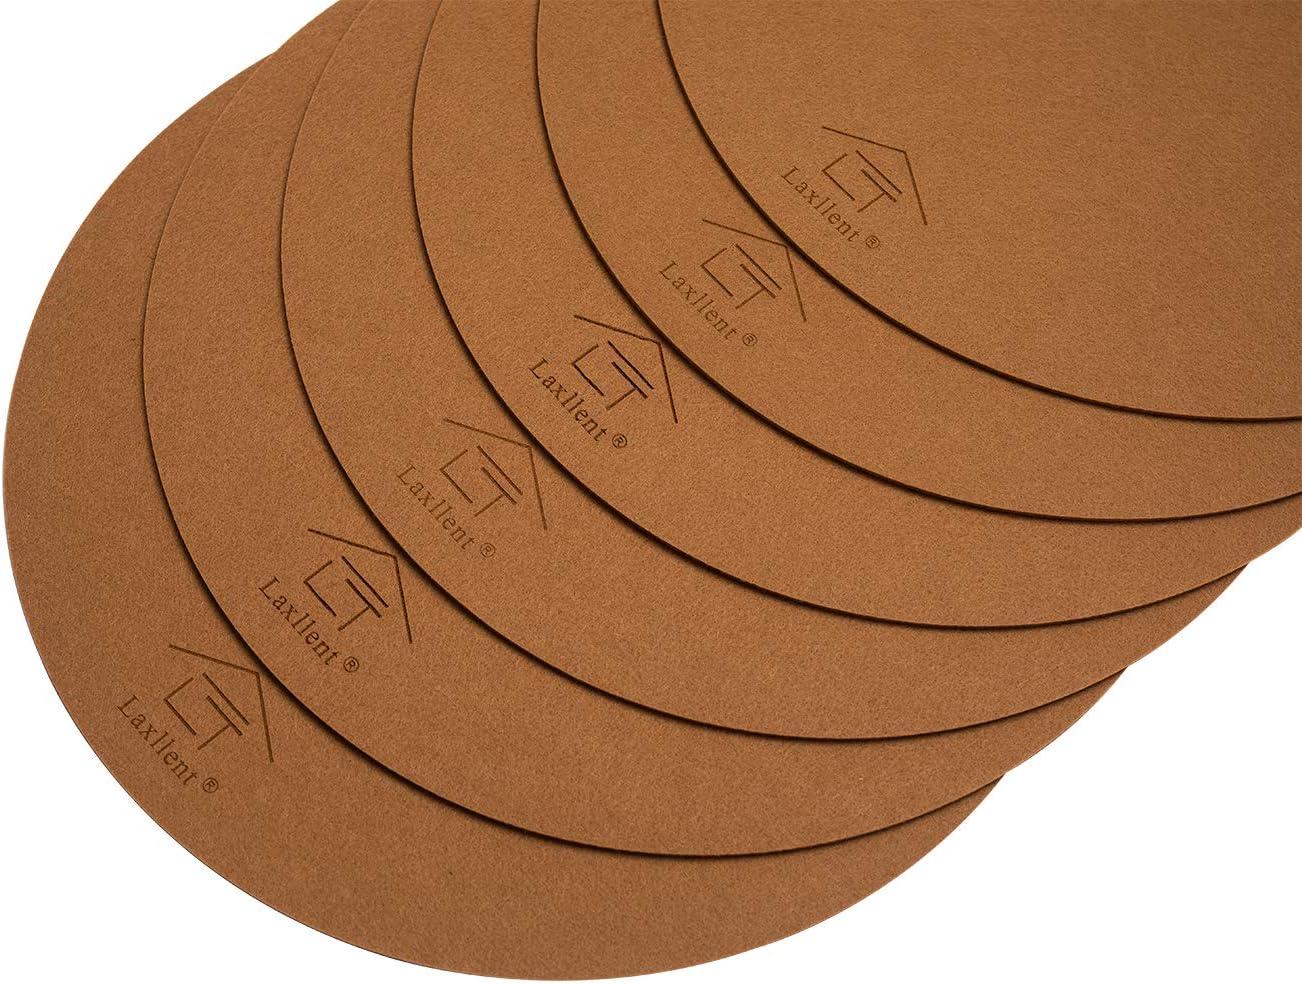 Laxllent Mantel Individual,Salvamanteles Individuales,6 Sets,Lavable M/ás Grueso Aislado,Rectangular,Tela de Fieltro,Gris Claro